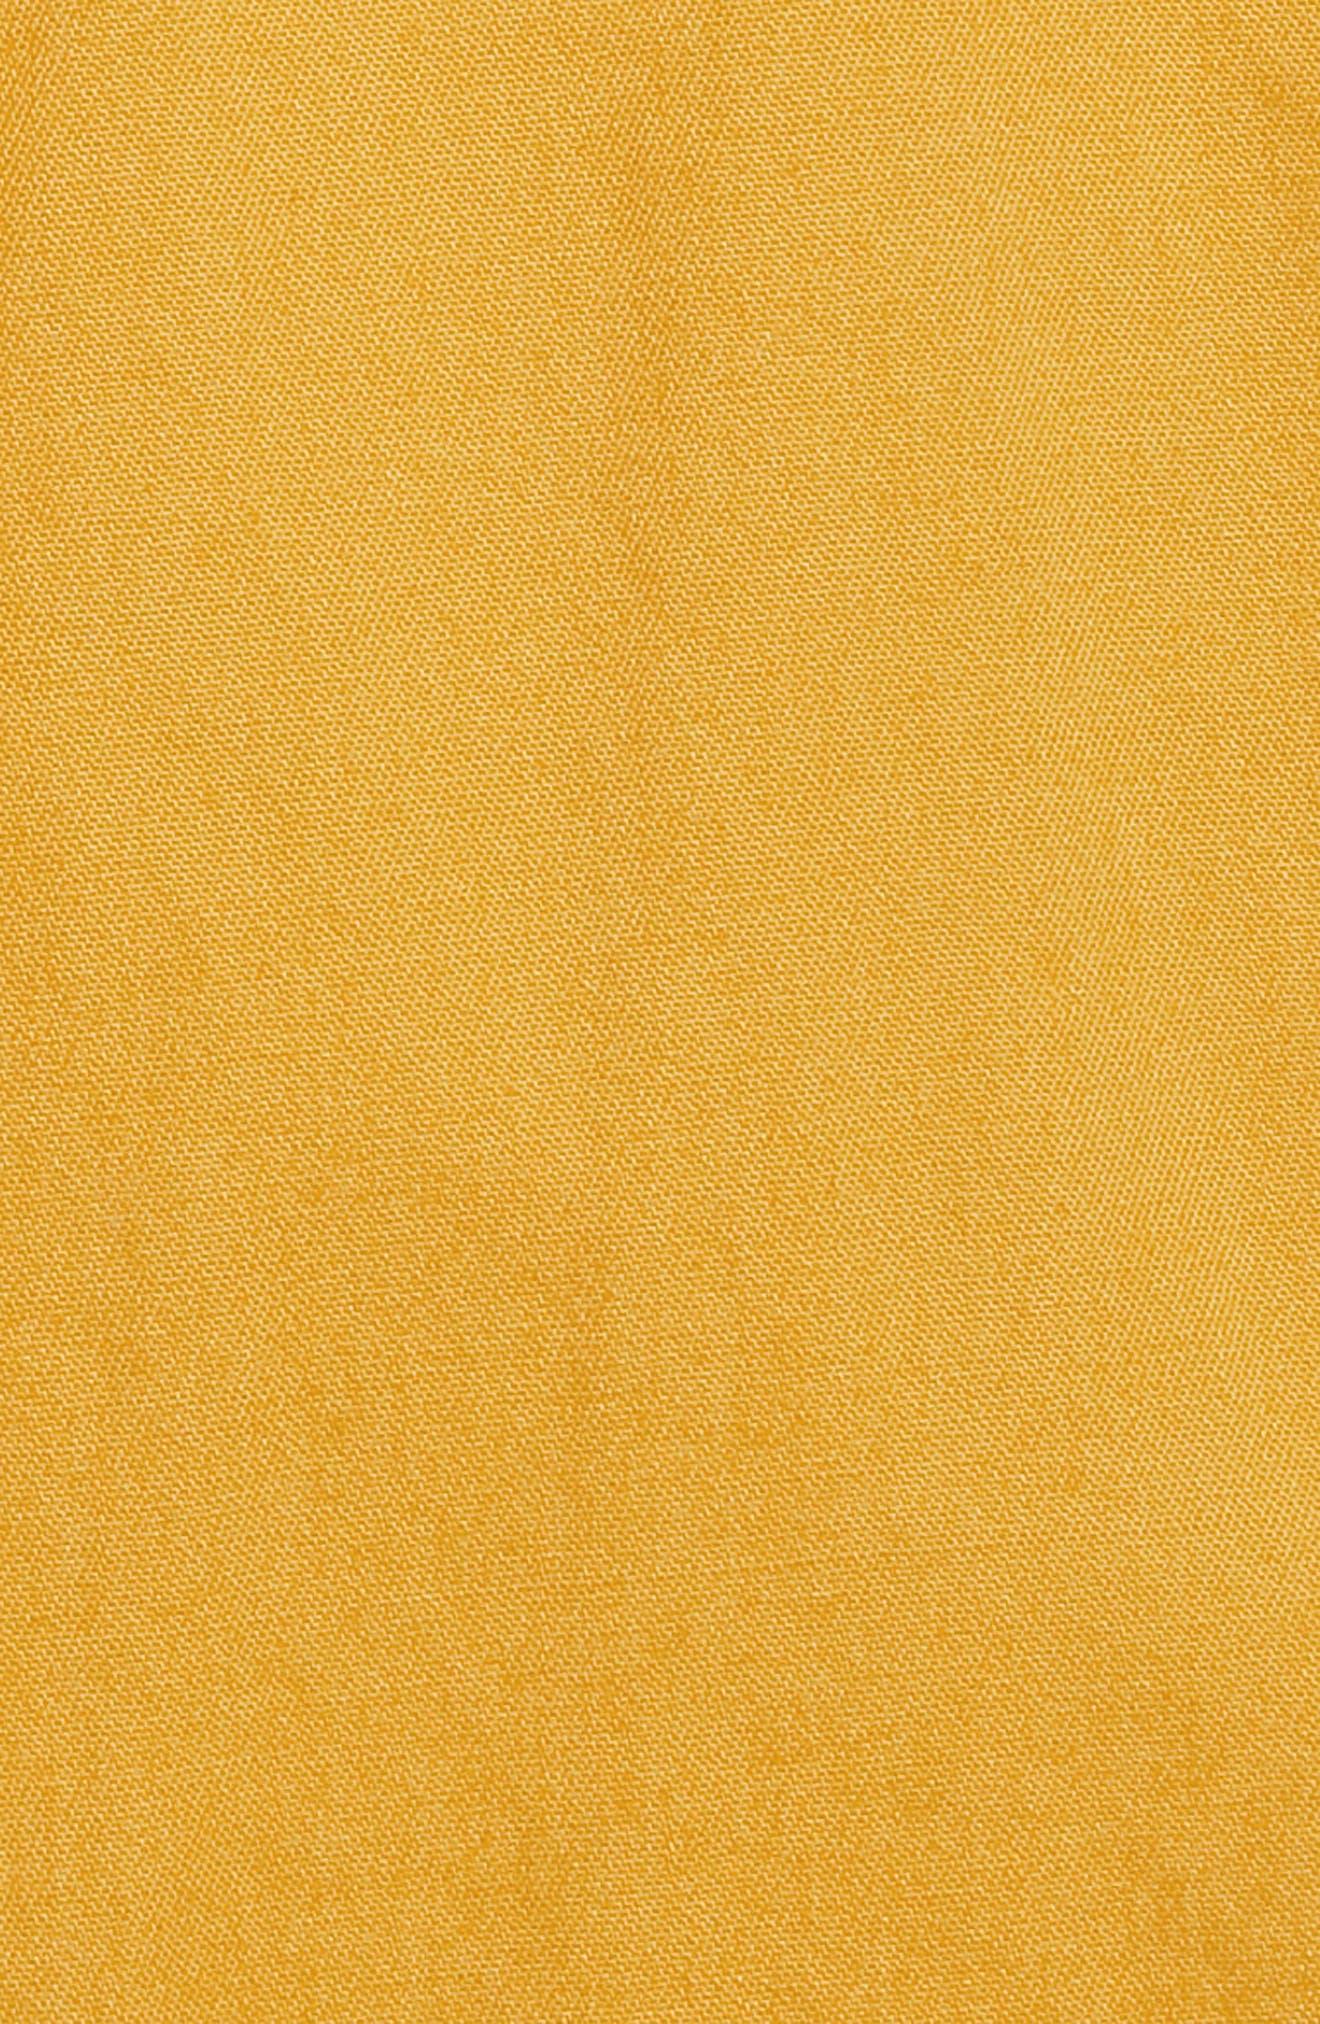 MINI BODEN,                             Colorful Chino Pants,                             Alternate thumbnail 2, color,                             YEL HONEYCOMB YELLOW